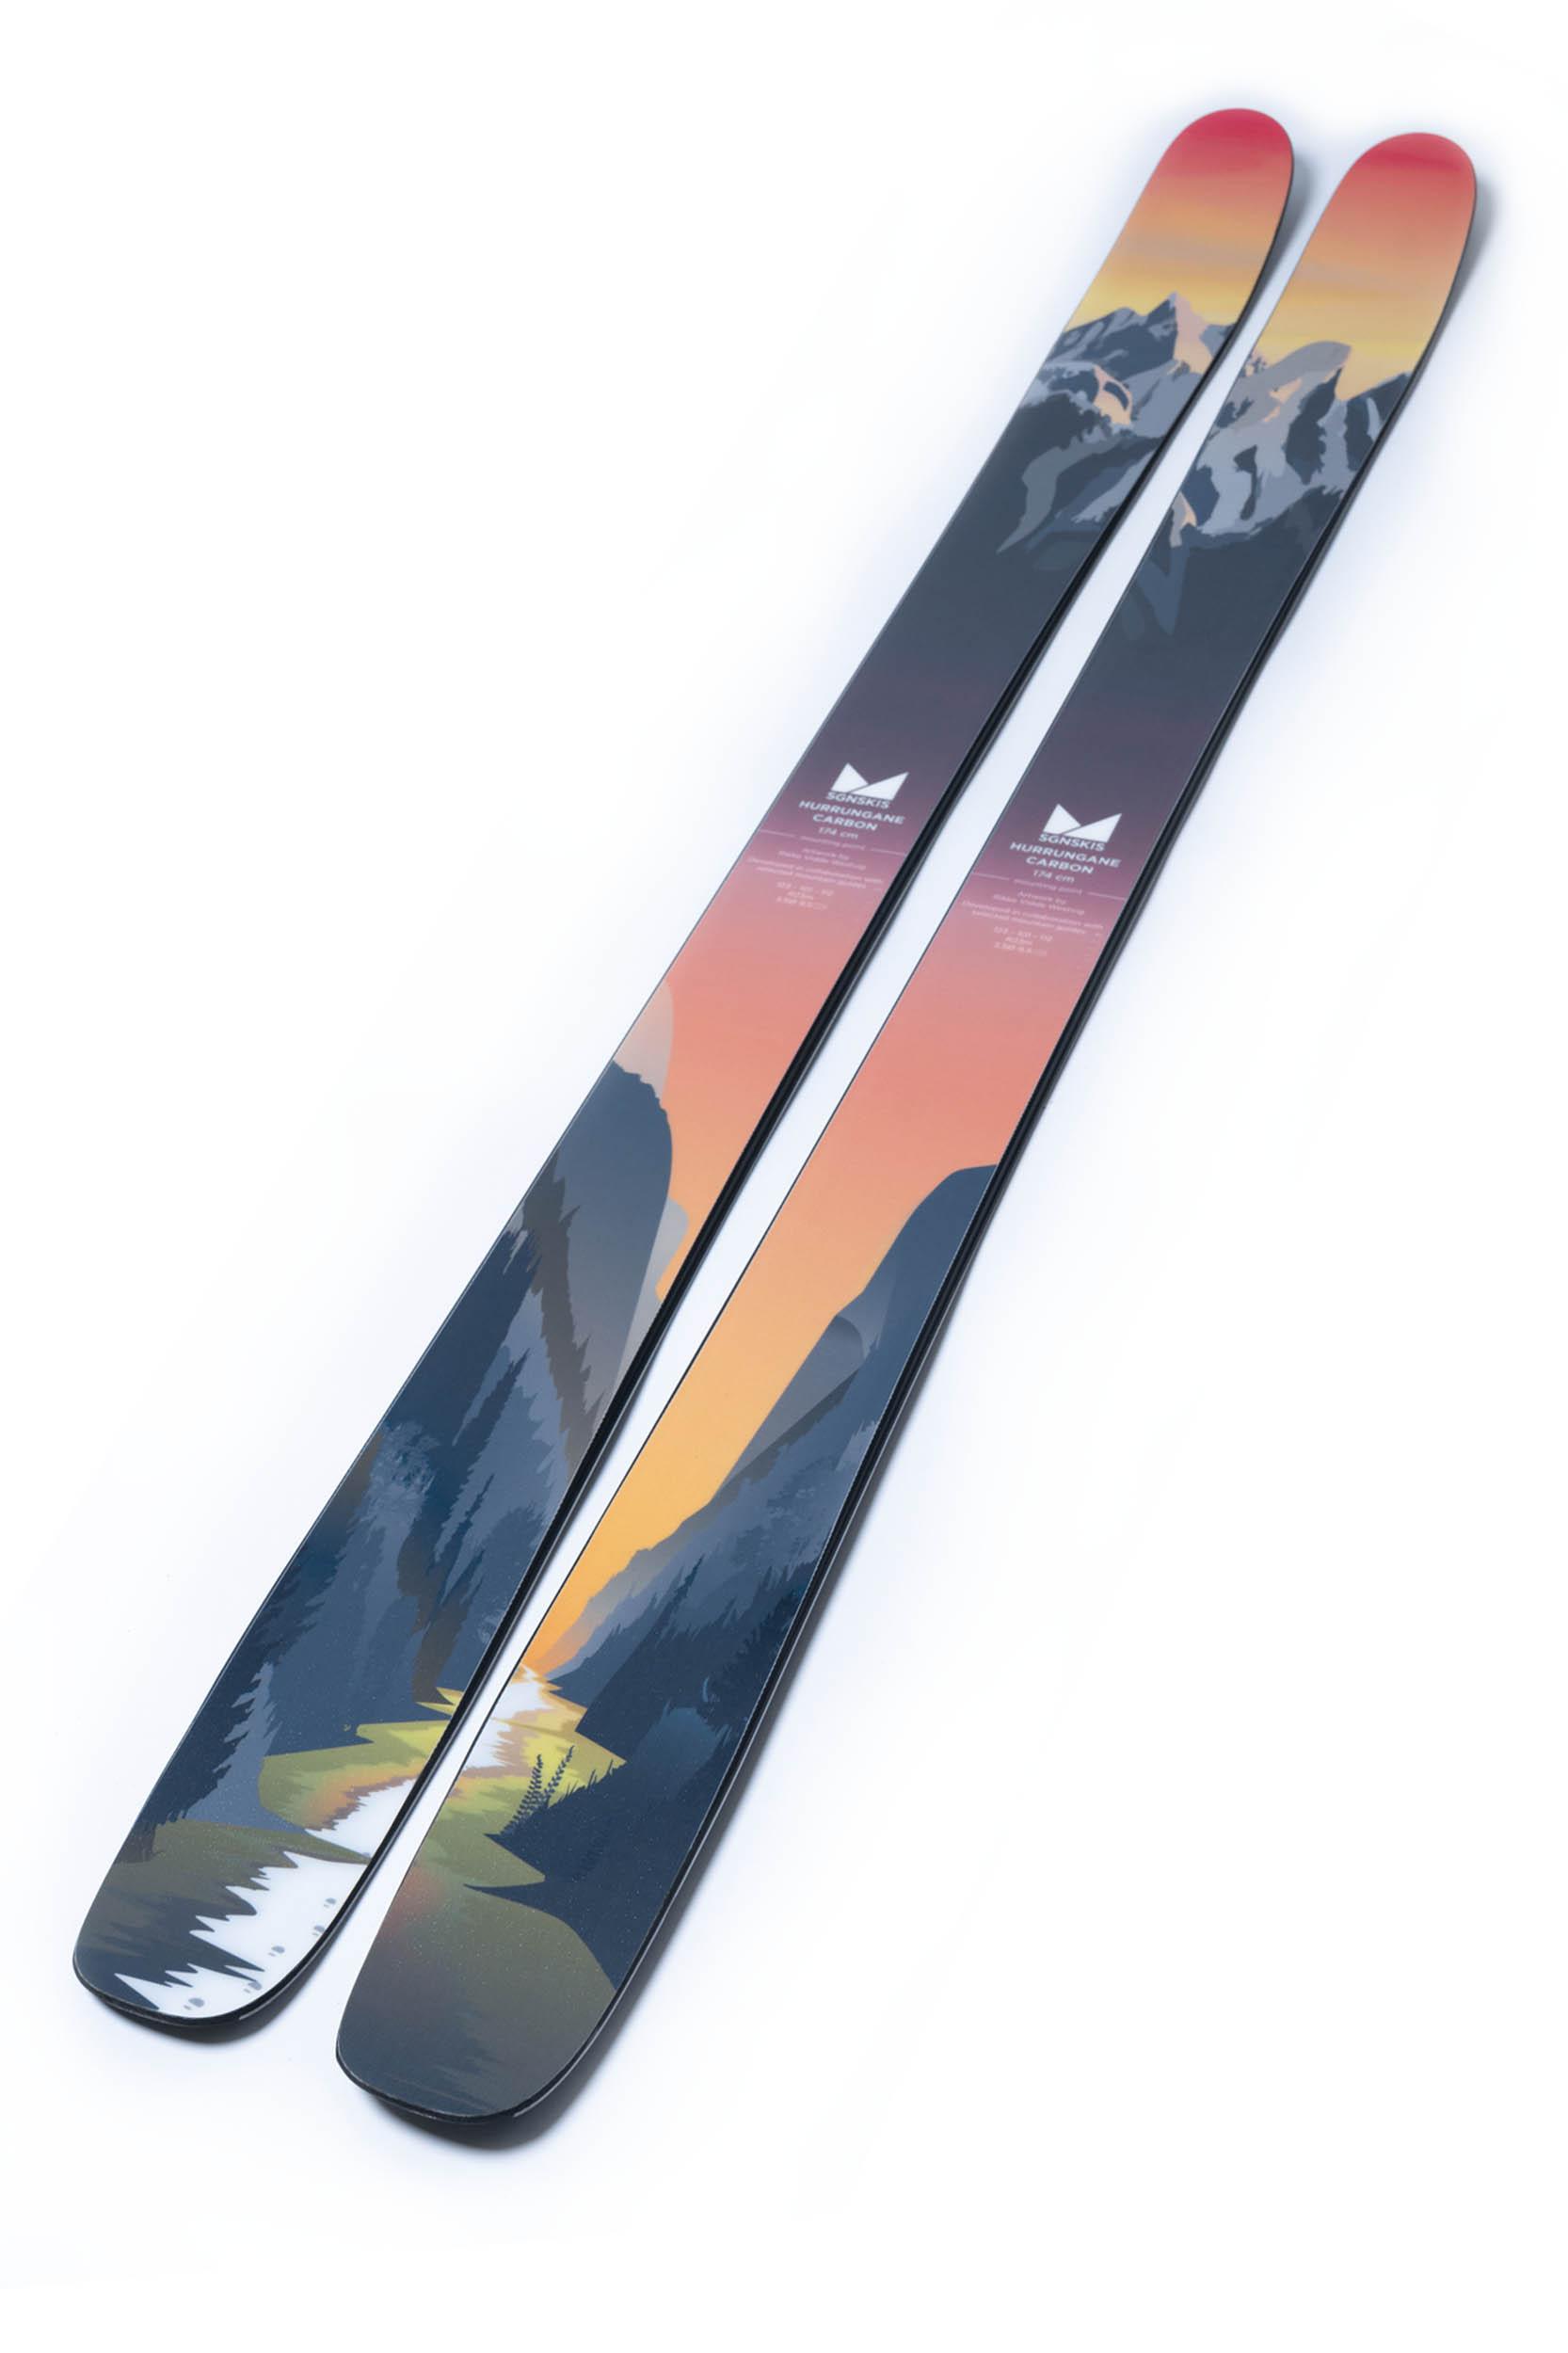 HURRUNGANE CAR. - SGN Skis - 2019